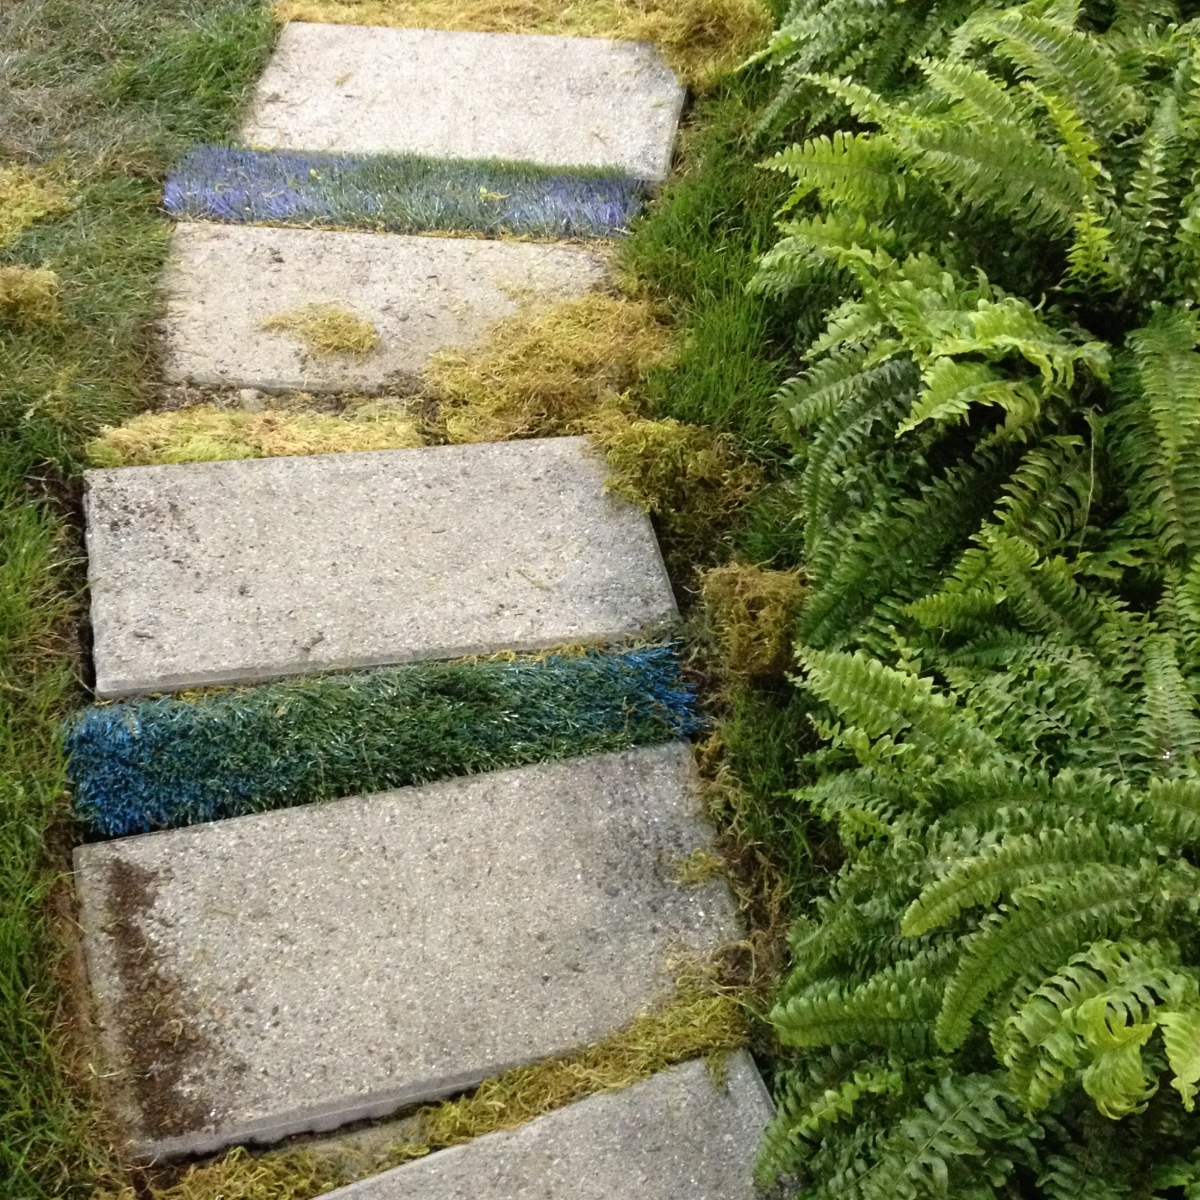 Stone path with turf